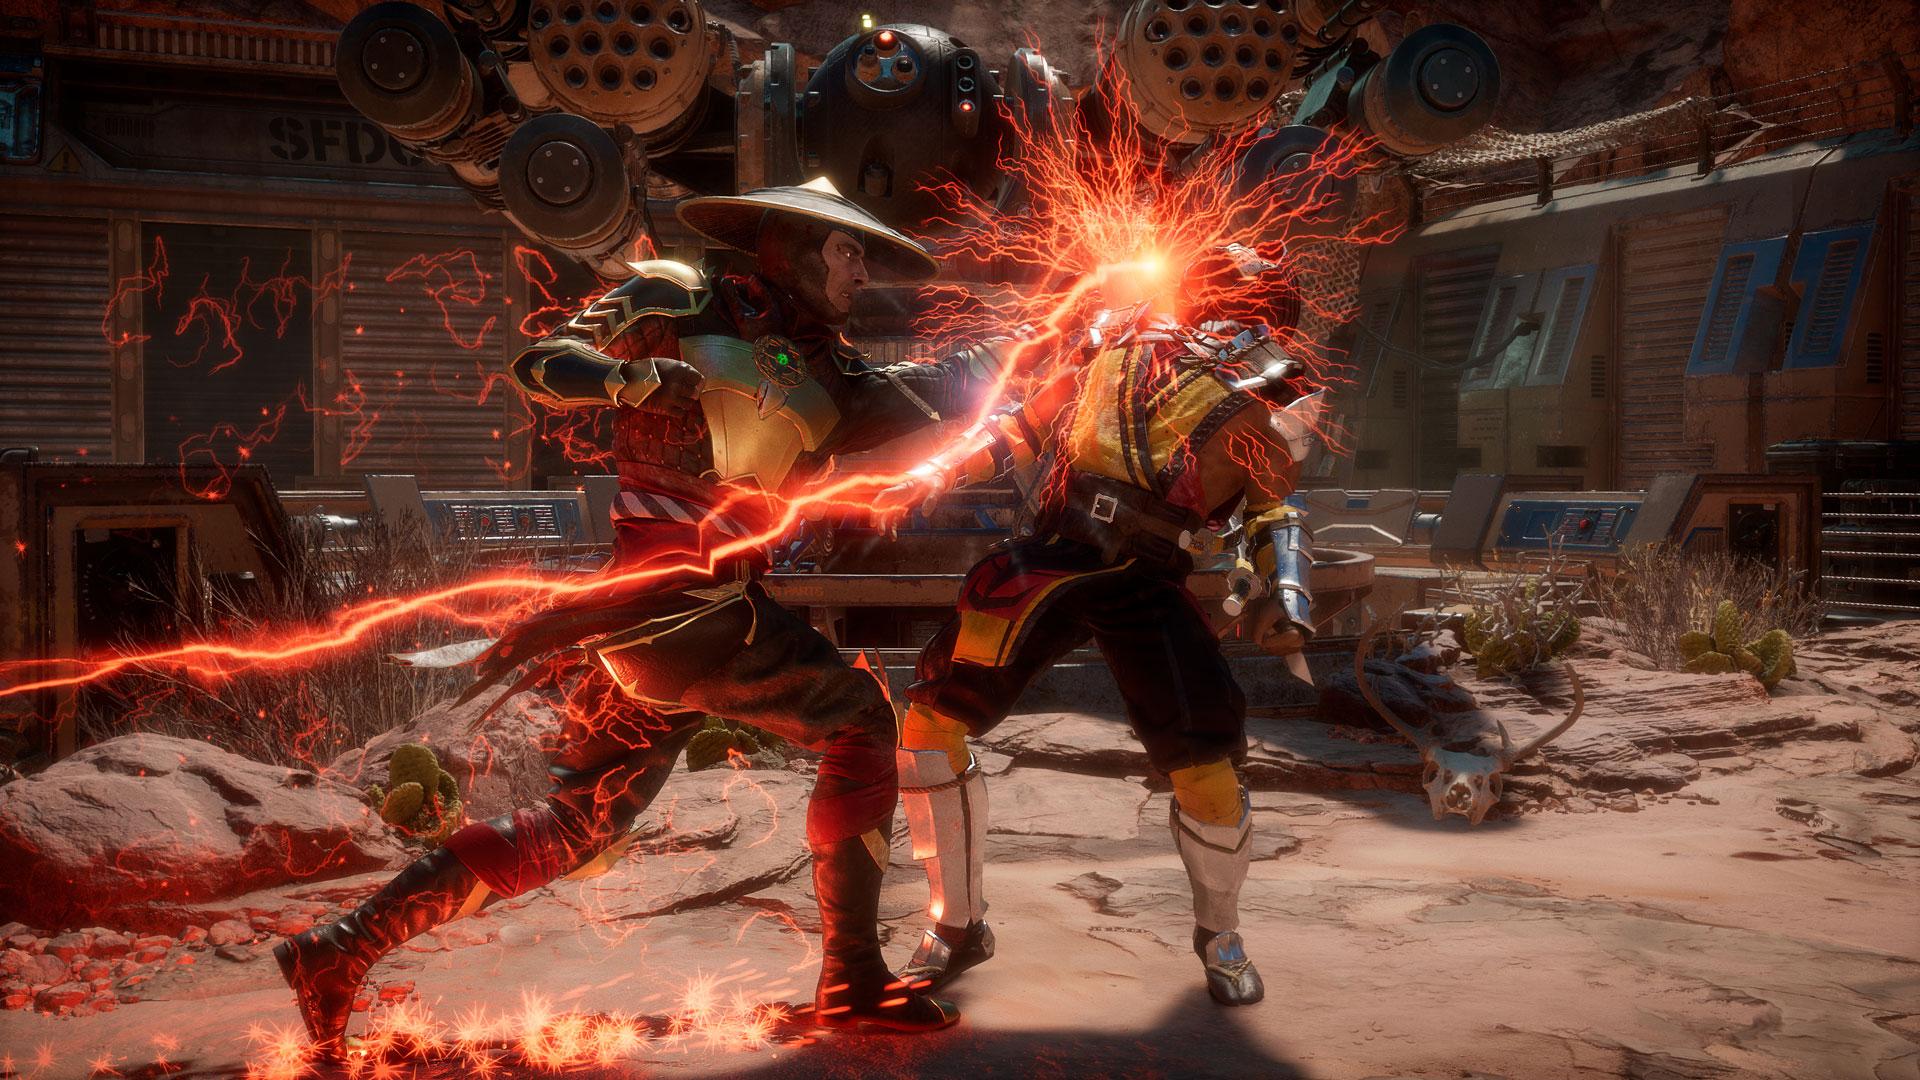 iaddp9xw.jpg - Mortal Kombat 11